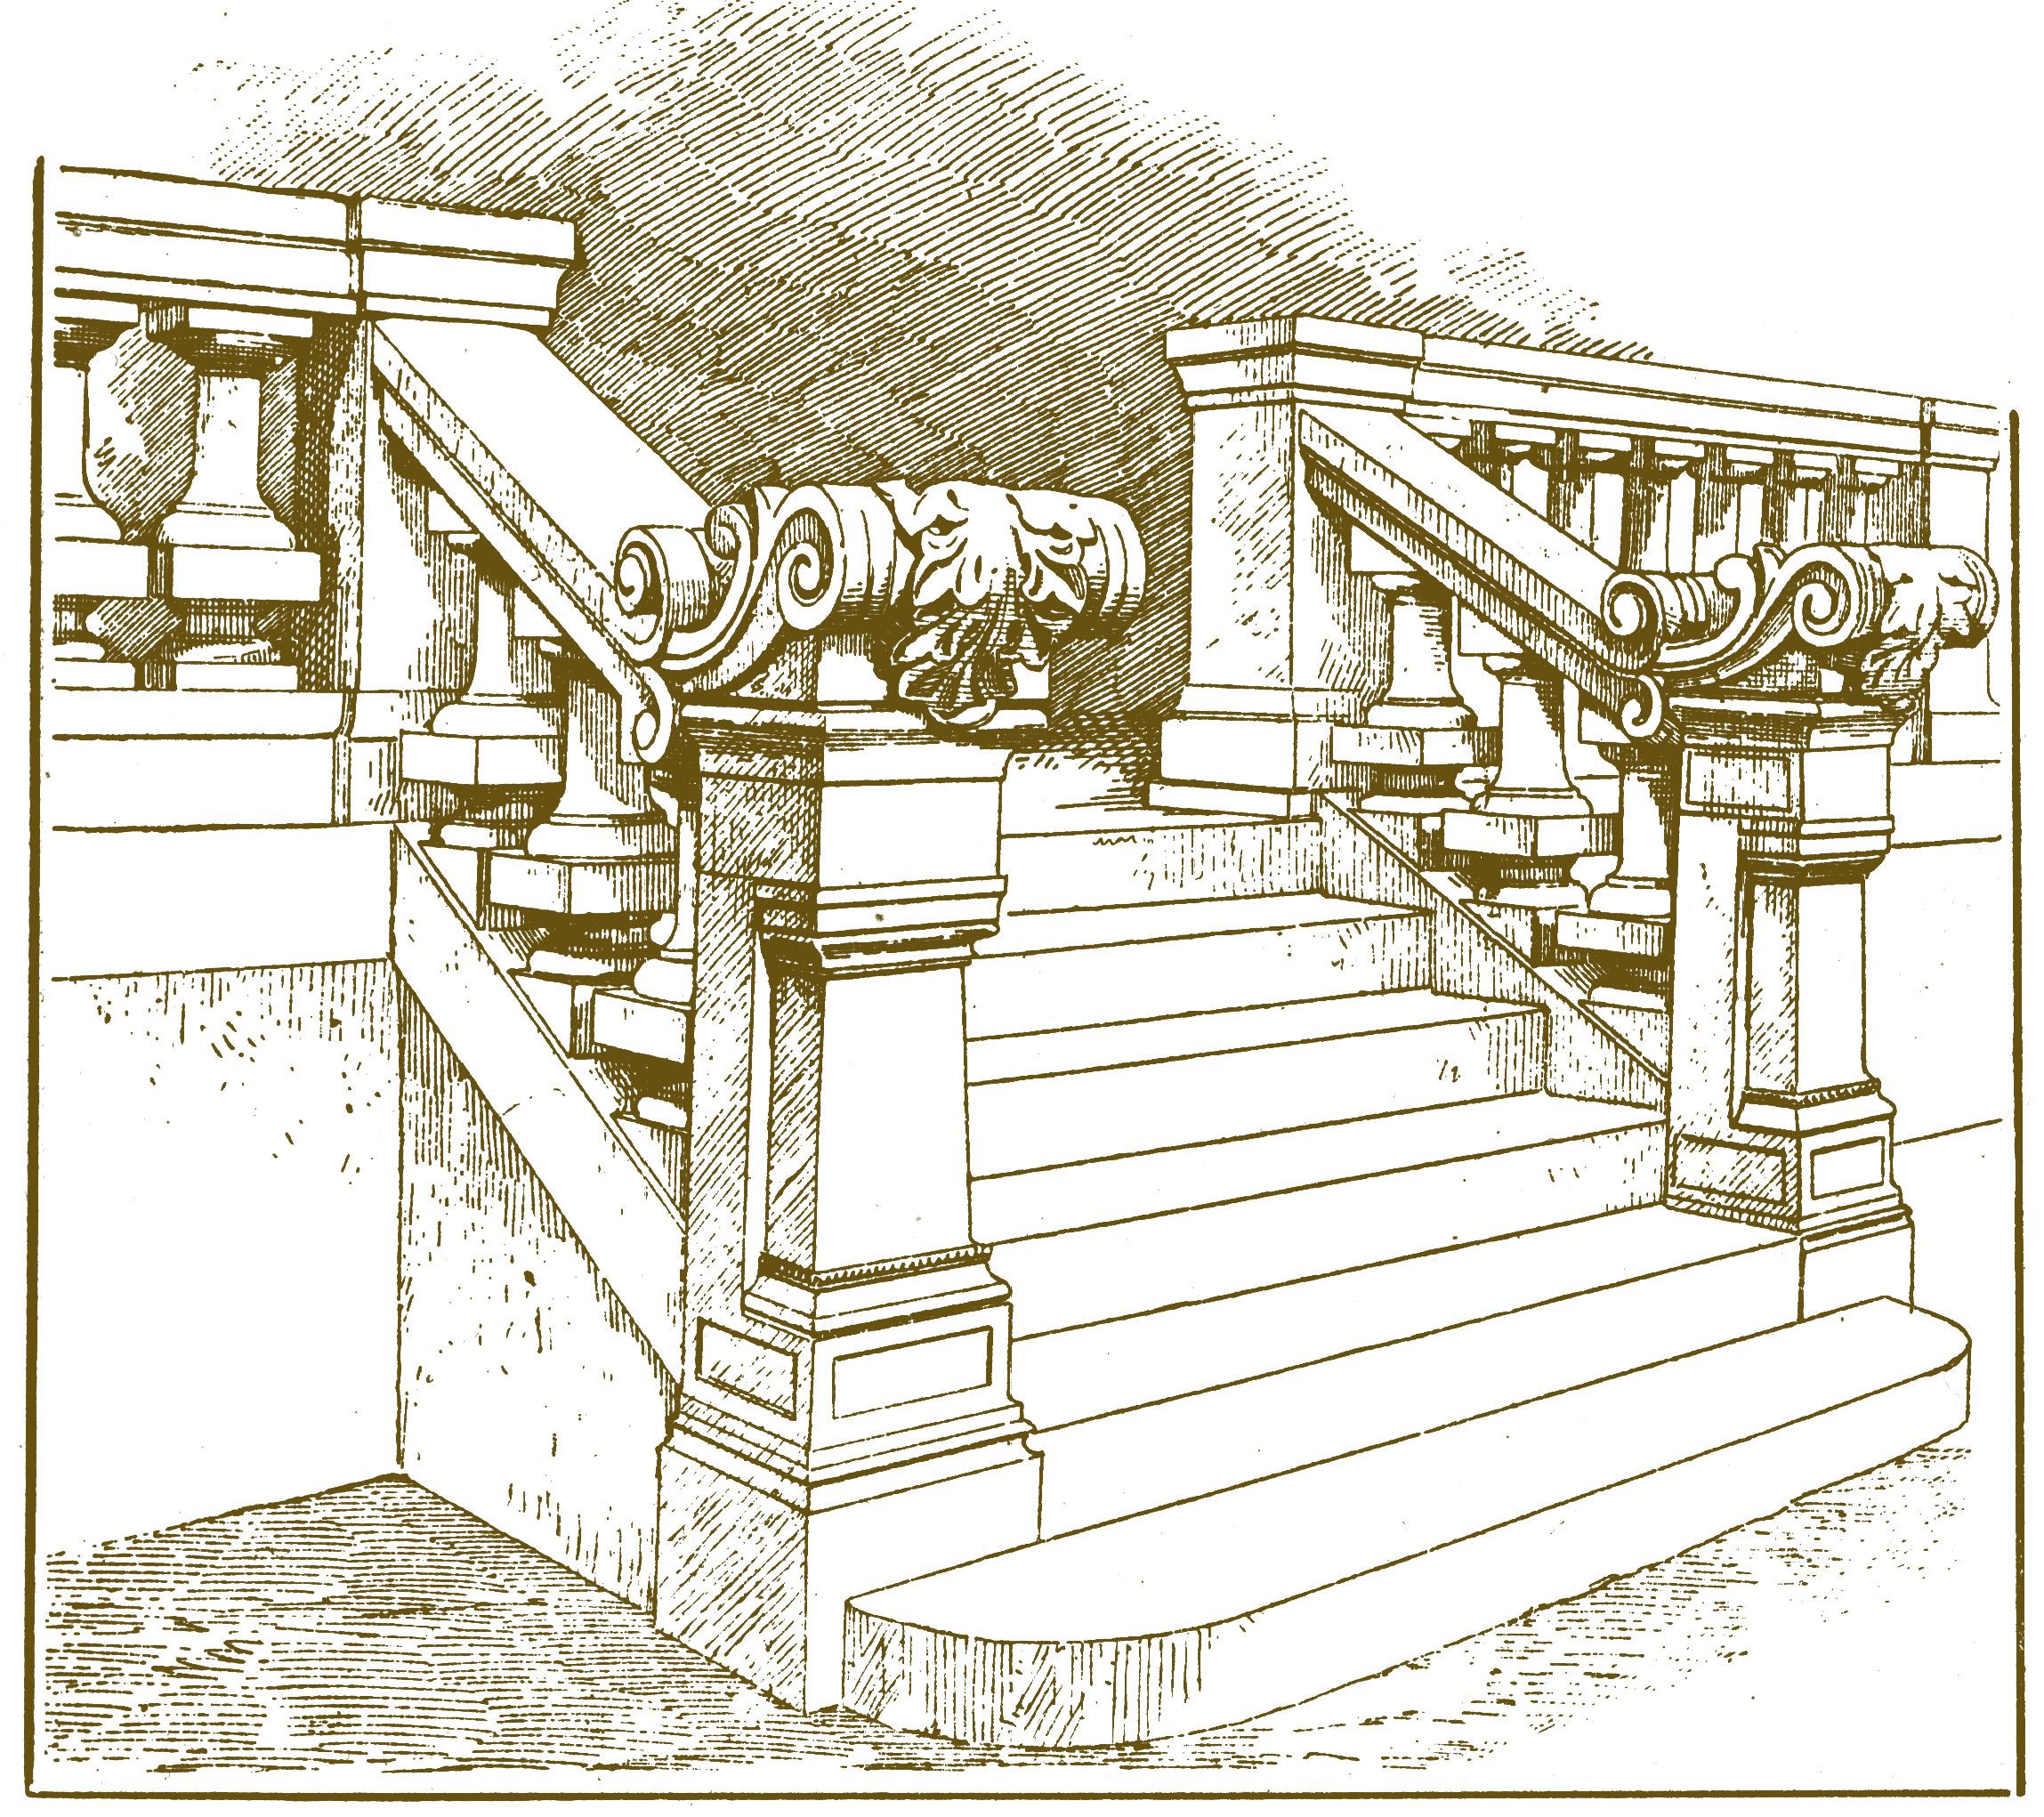 рисунок архитектурные элементы